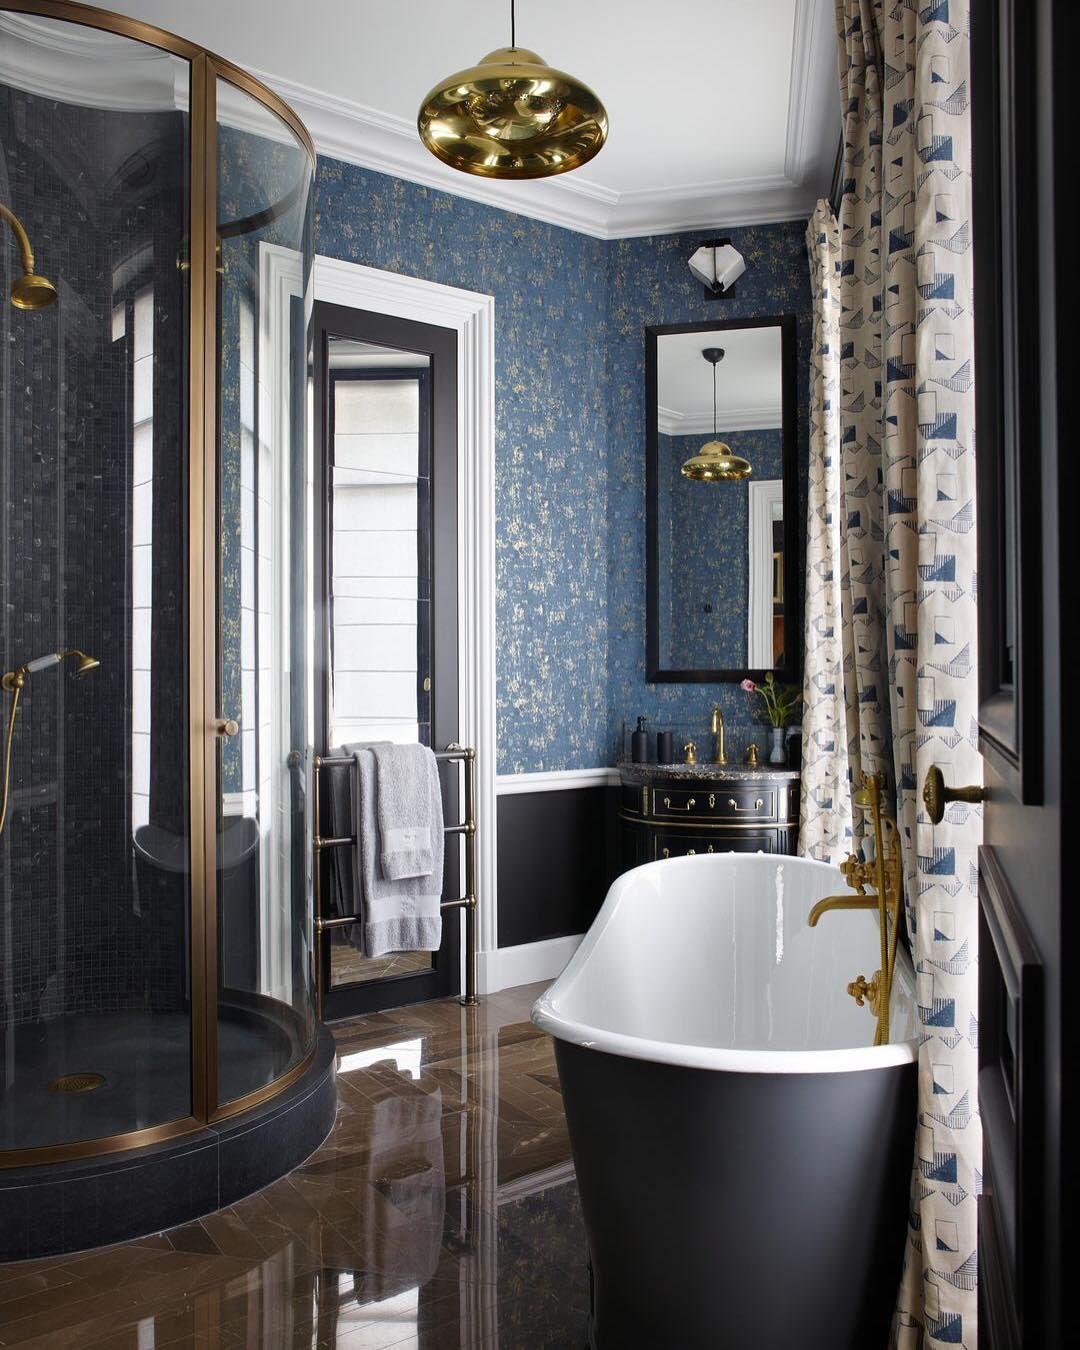 Best Bathroom Interior Design For Inspiration Luchshie Interery Vannyh Komnat Dlya Vdohnoveniya Ideas O Bathroom Interior Design Tuscan Design Bathroom Layout Elle decor best bathrooms